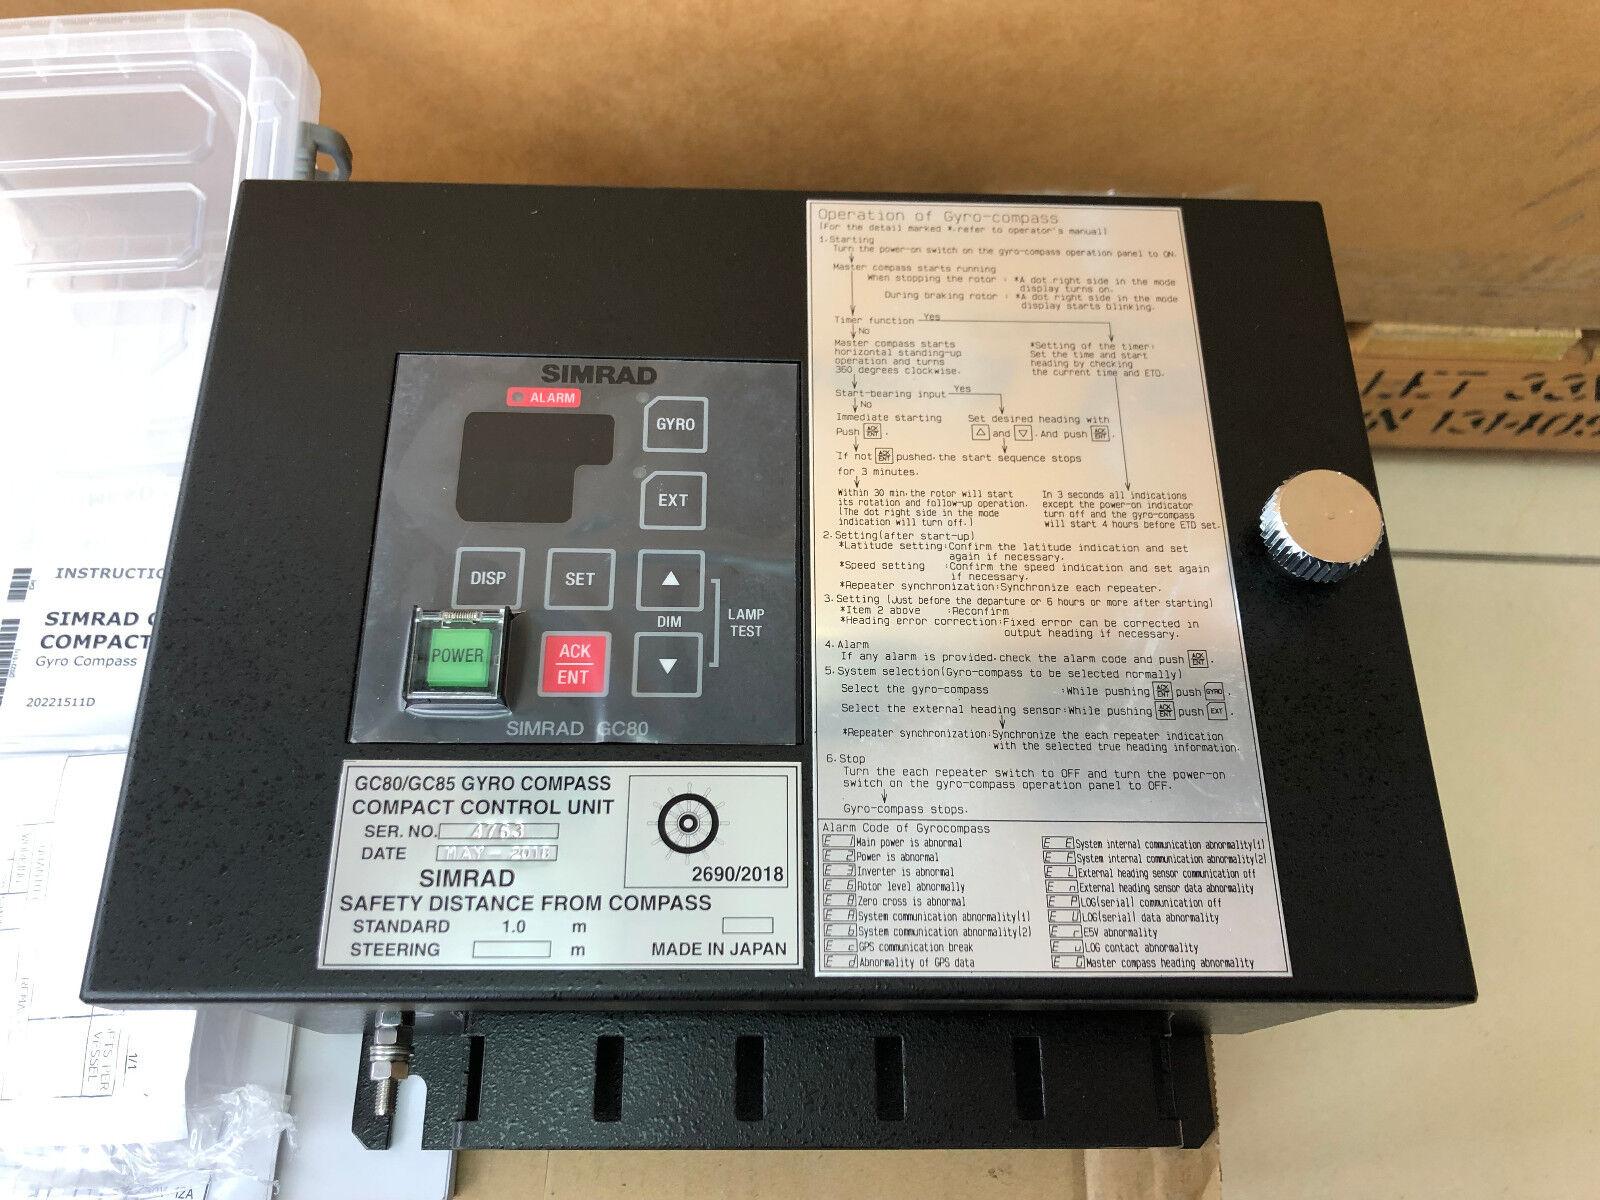 SIMRAD GC80 GC85 Compact Control Unit